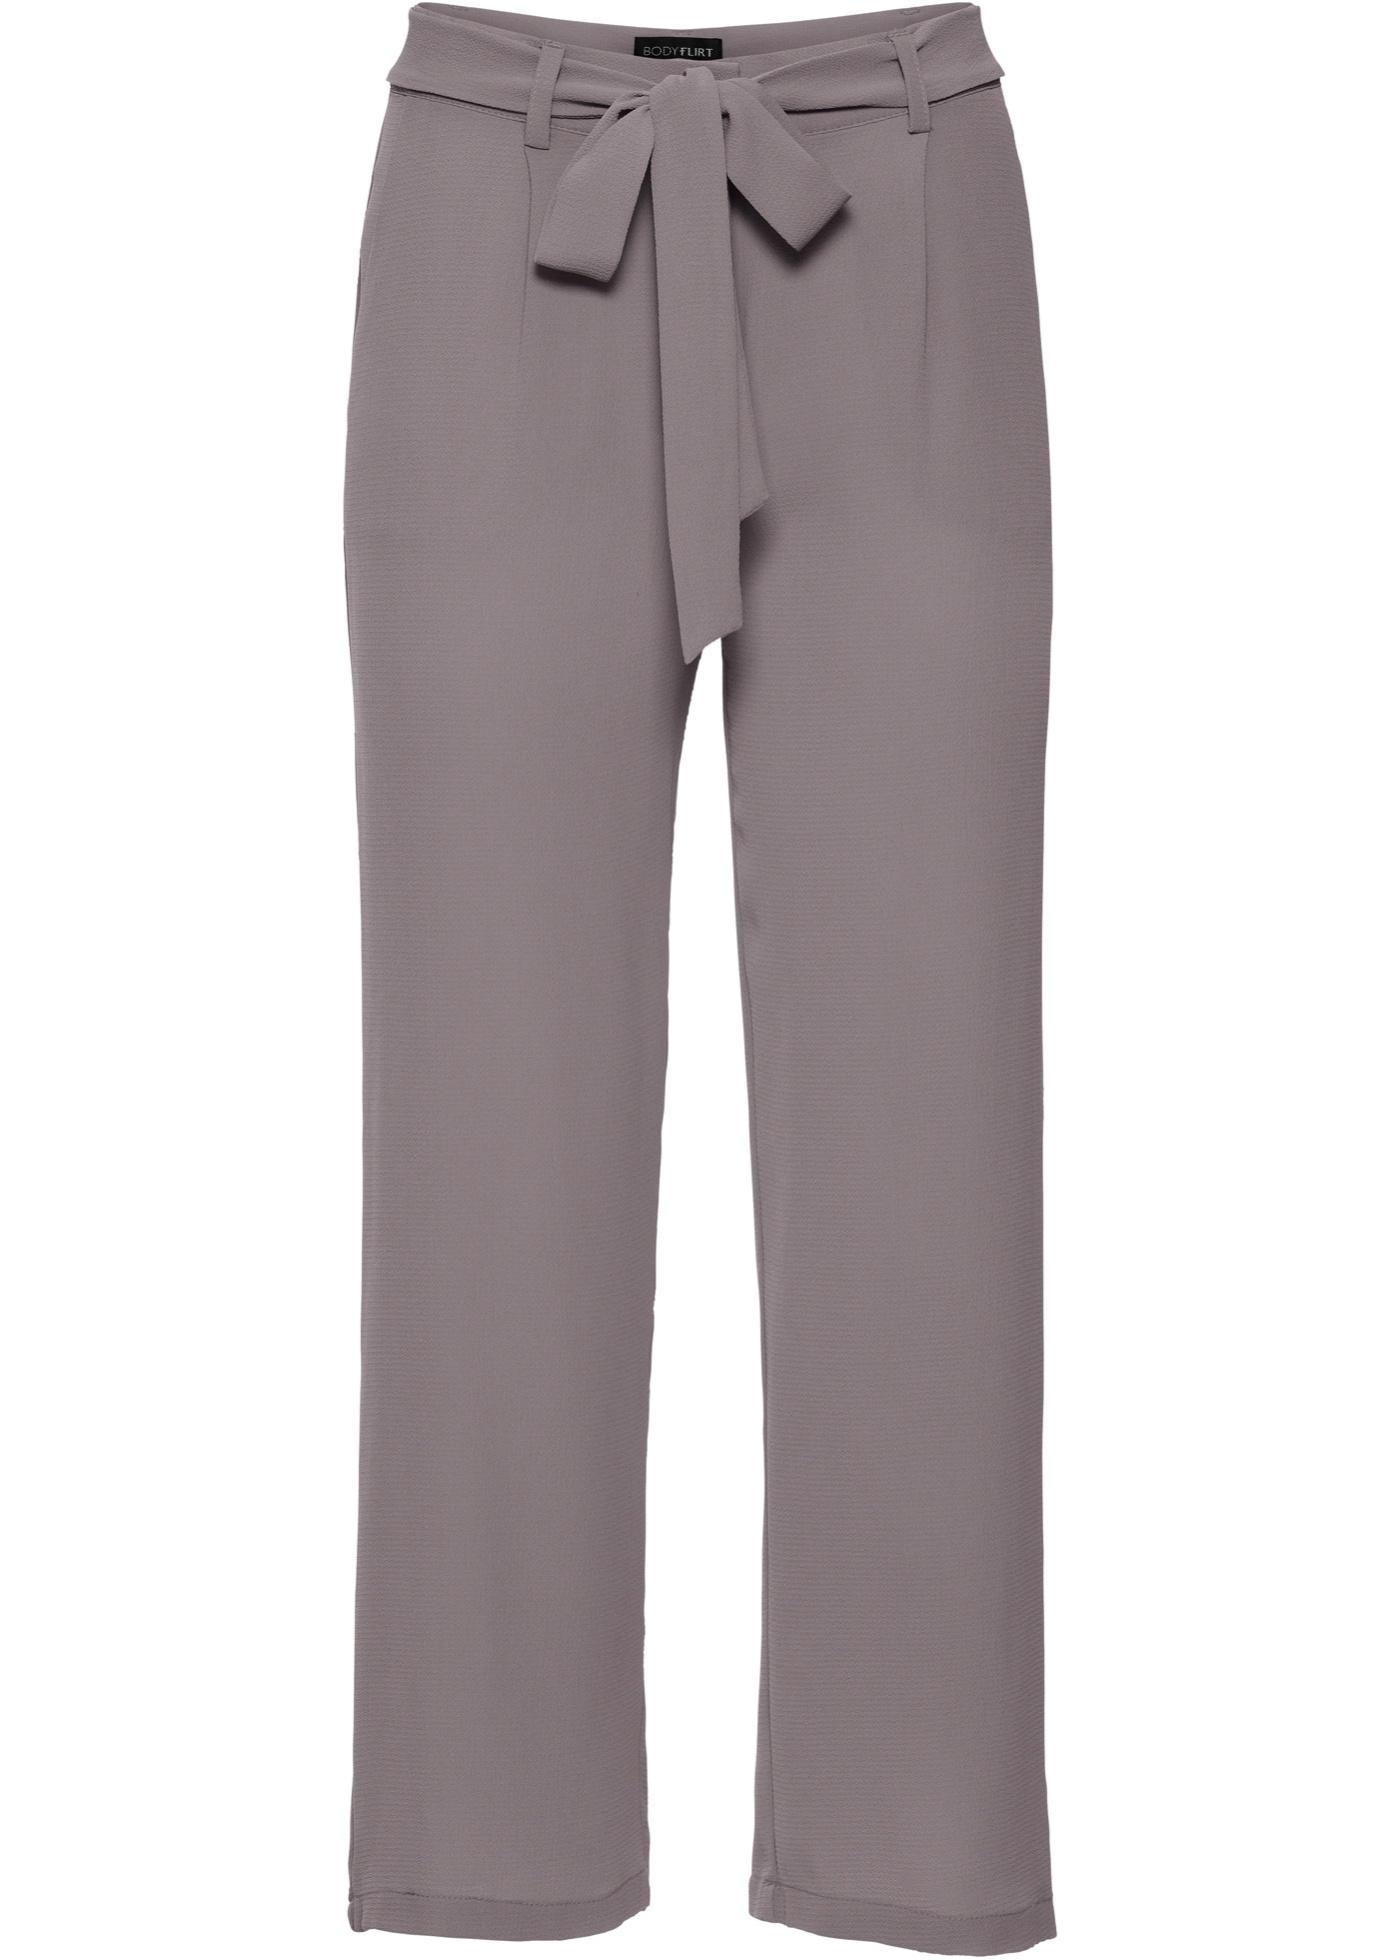 Pantalon 7/8, jambes amples